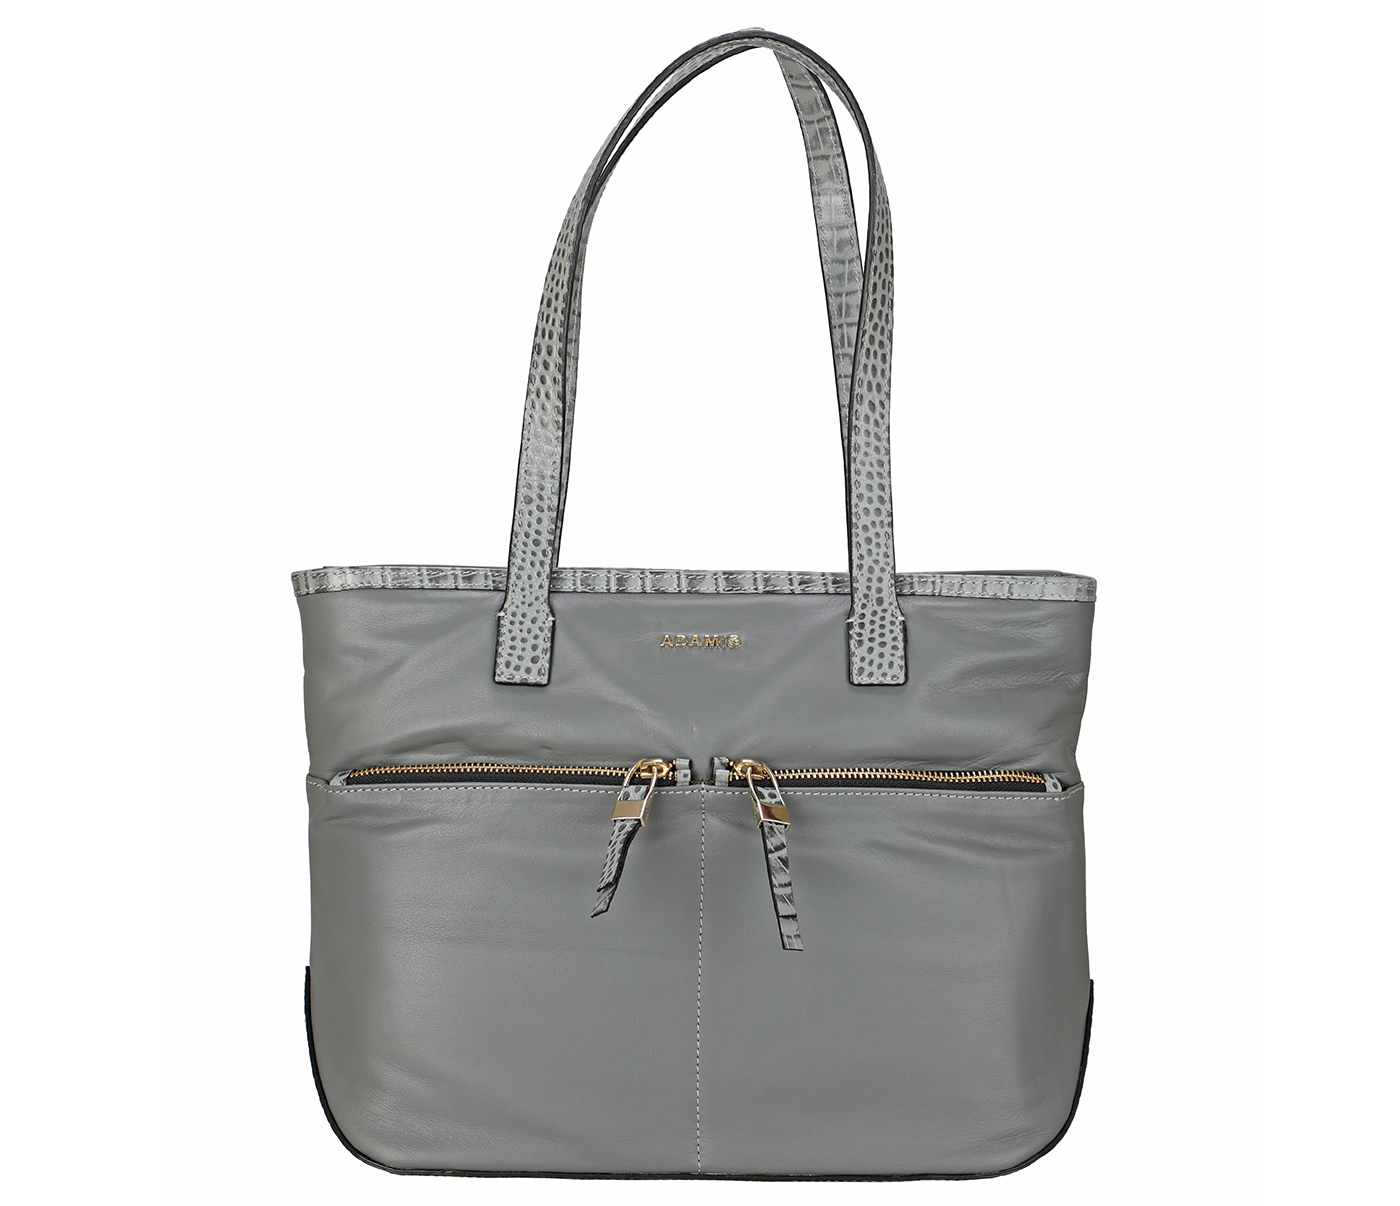 Handbag - B877